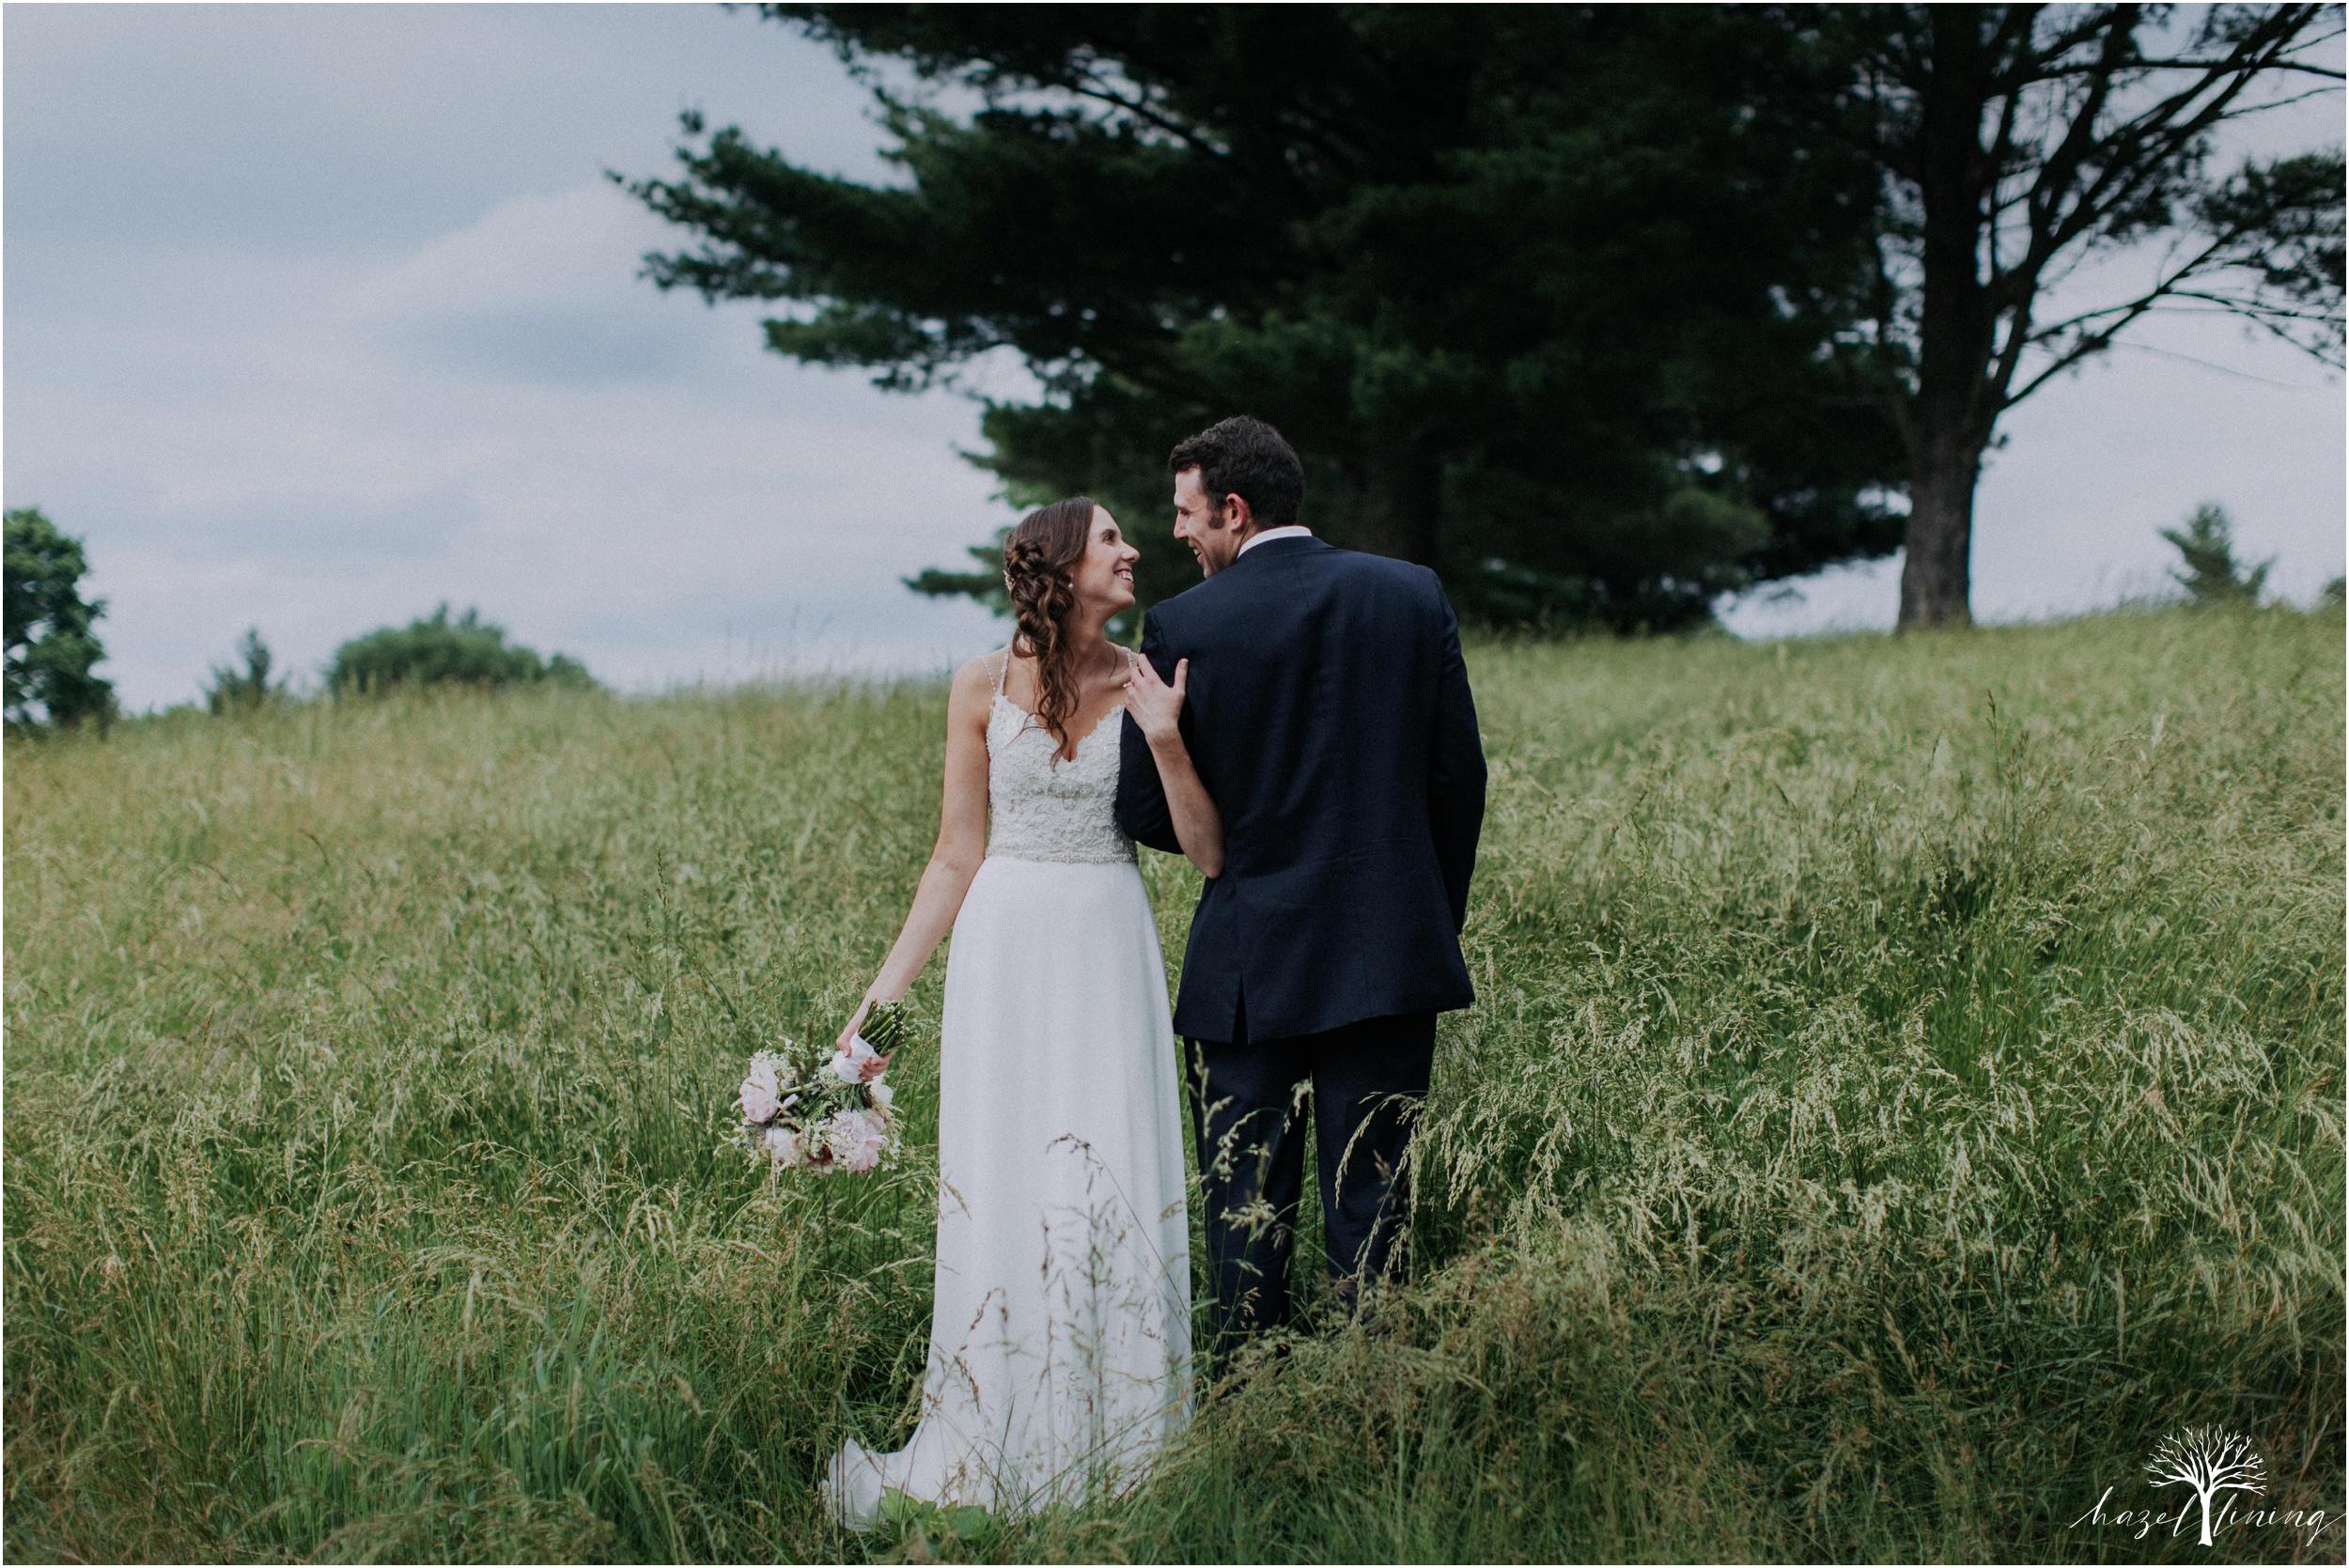 hazel-lining-travel-wedding-elopement-photography_0098.jpg